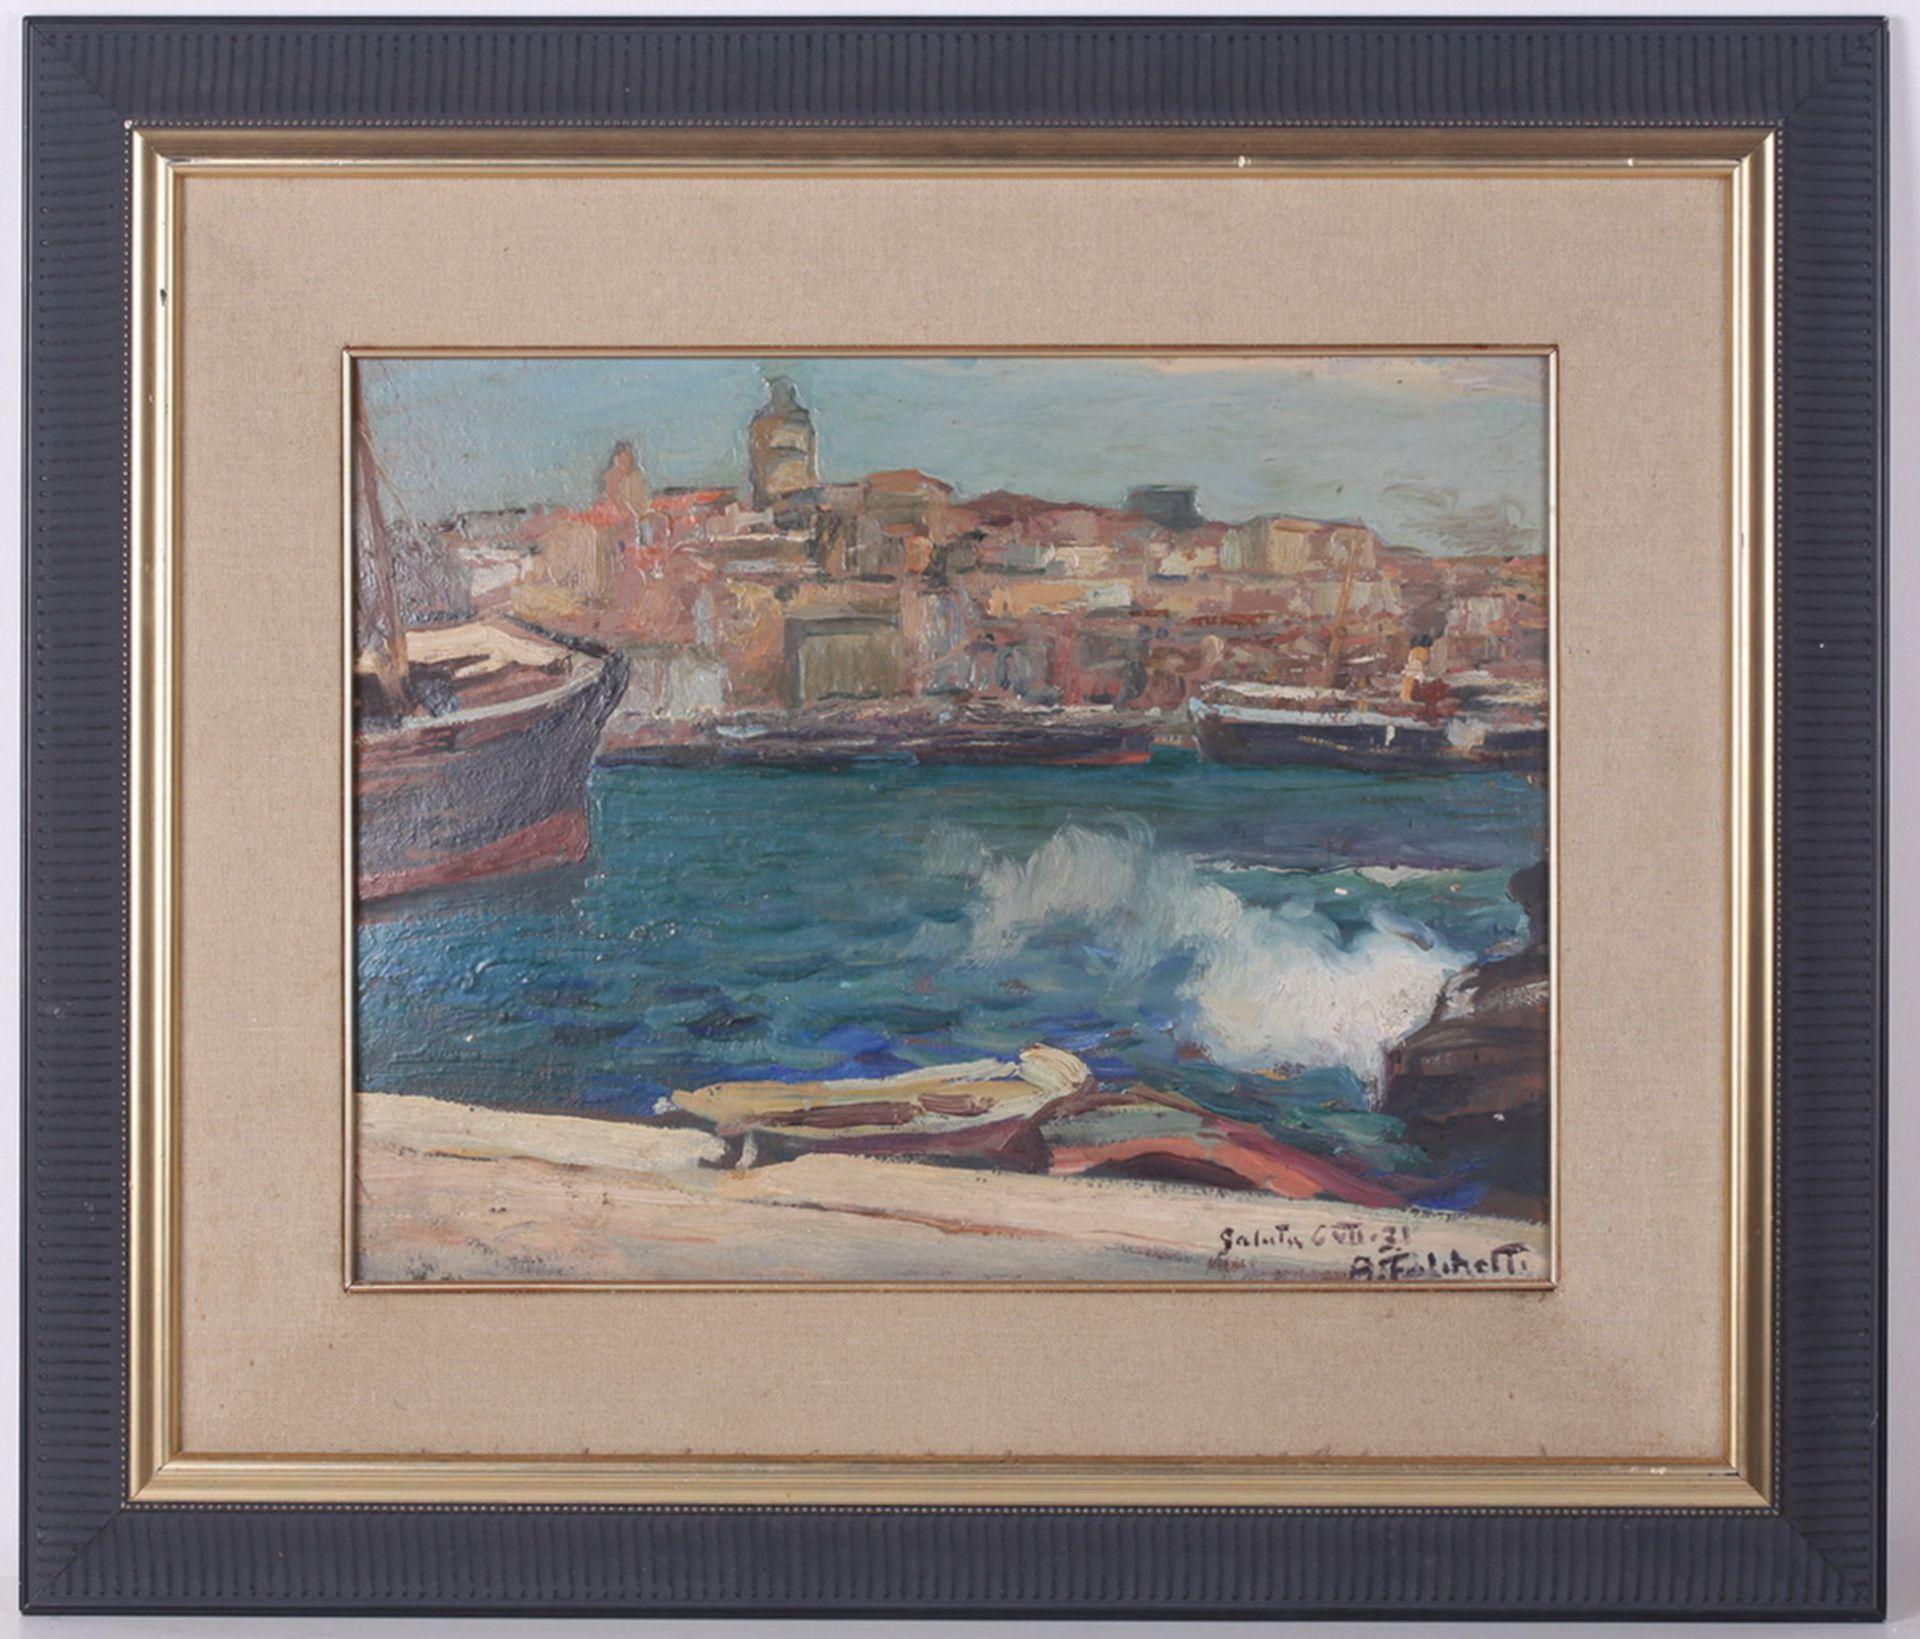 Falchetti, Alberto. Galuta. 1931. Oil on canvas. 36x45 cm.<br>Signed and framed. - Bild 3 aus 4